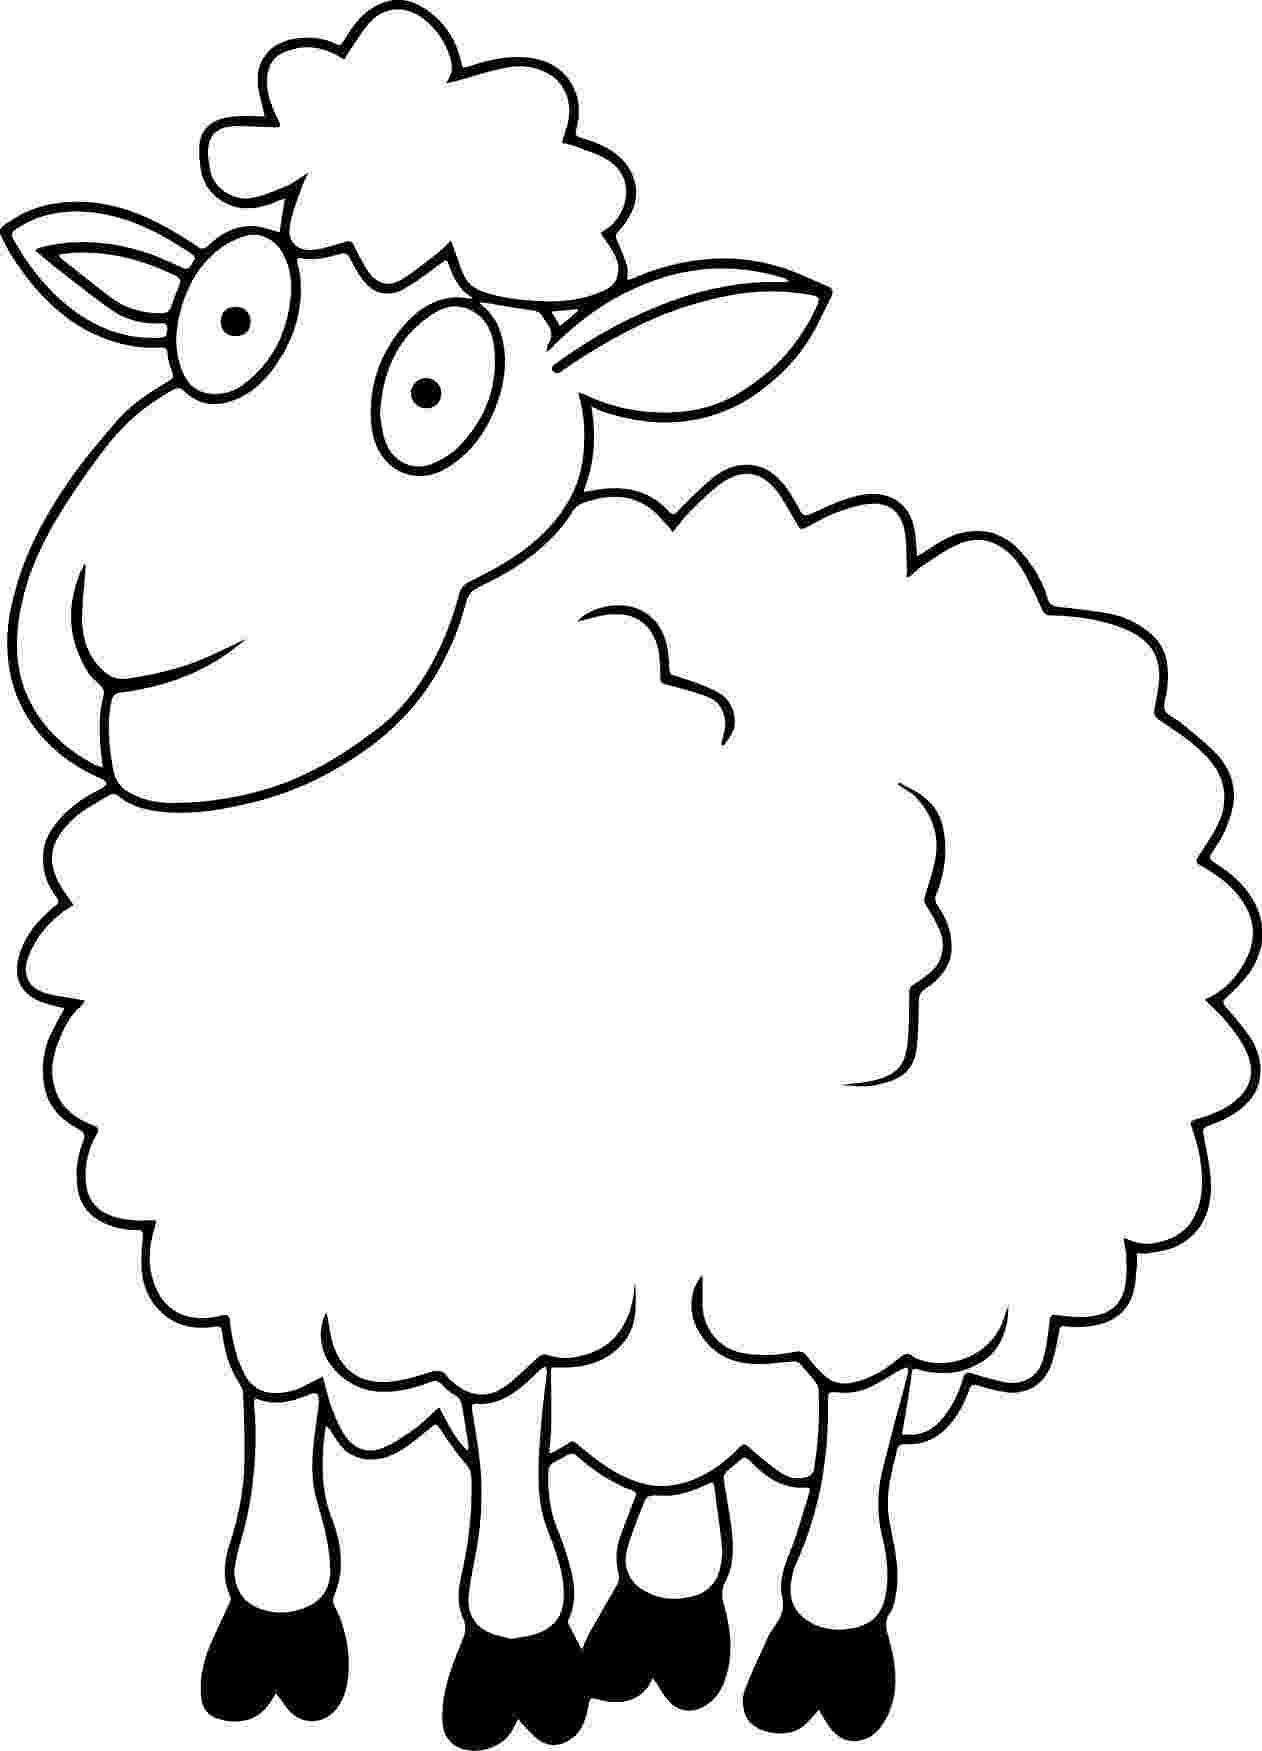 sheep coloring sheet free printable sheep coloring pages for kids sheep sheet coloring